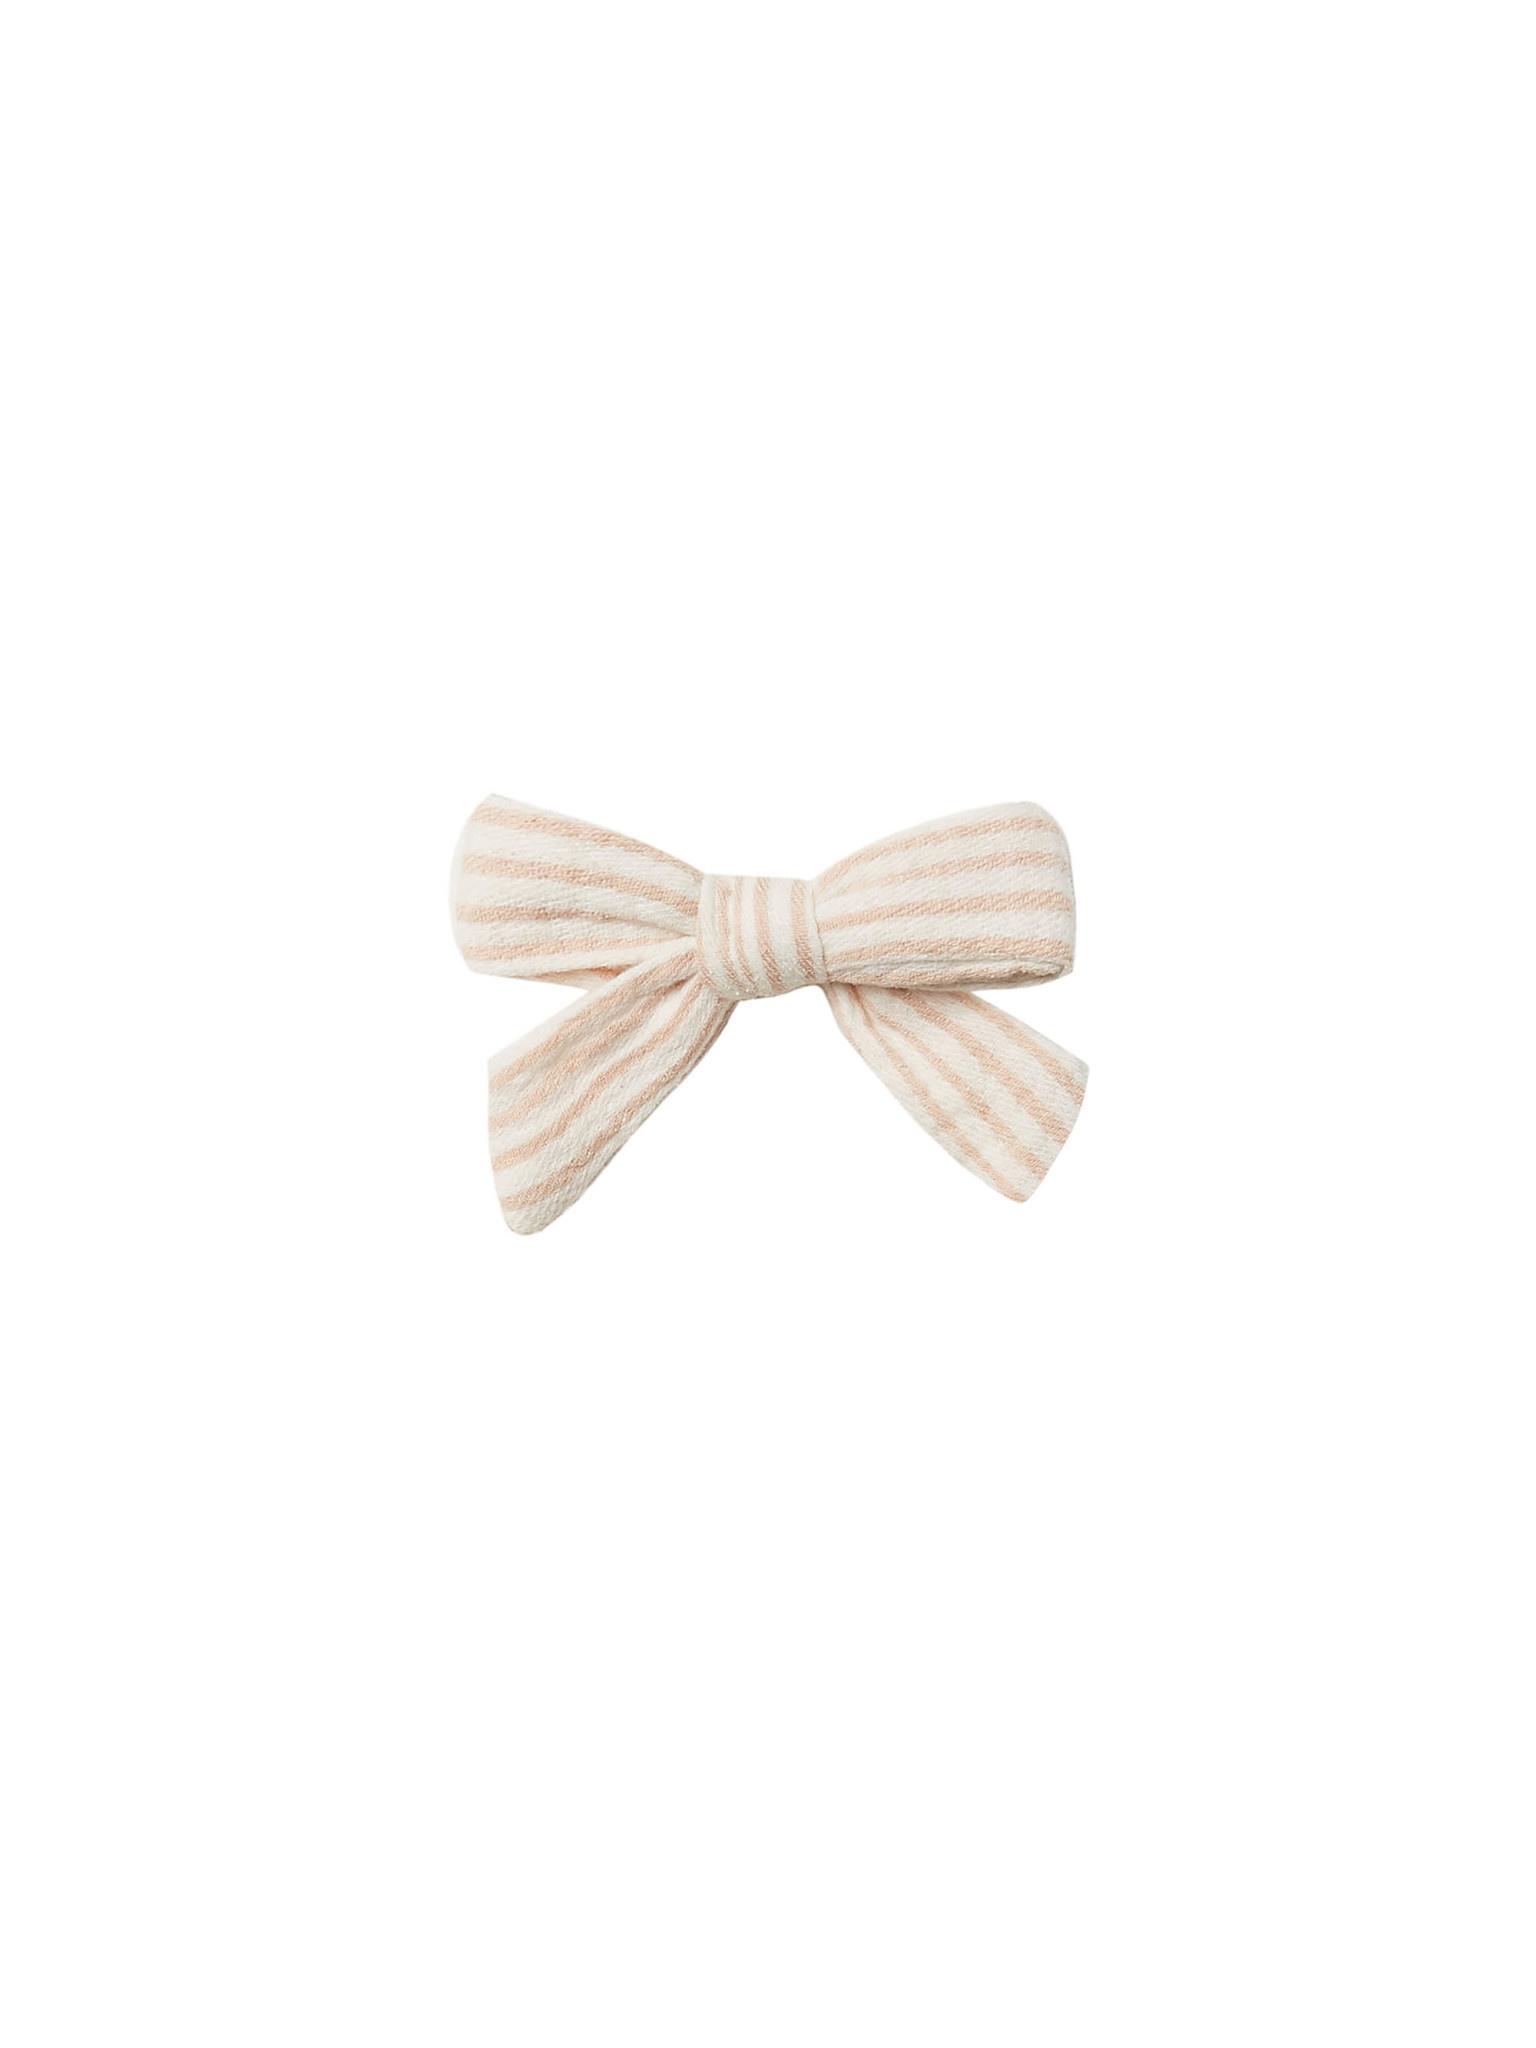 Quincy Mae - QM QM BA - Petal Stripe Schoolgirl Bow